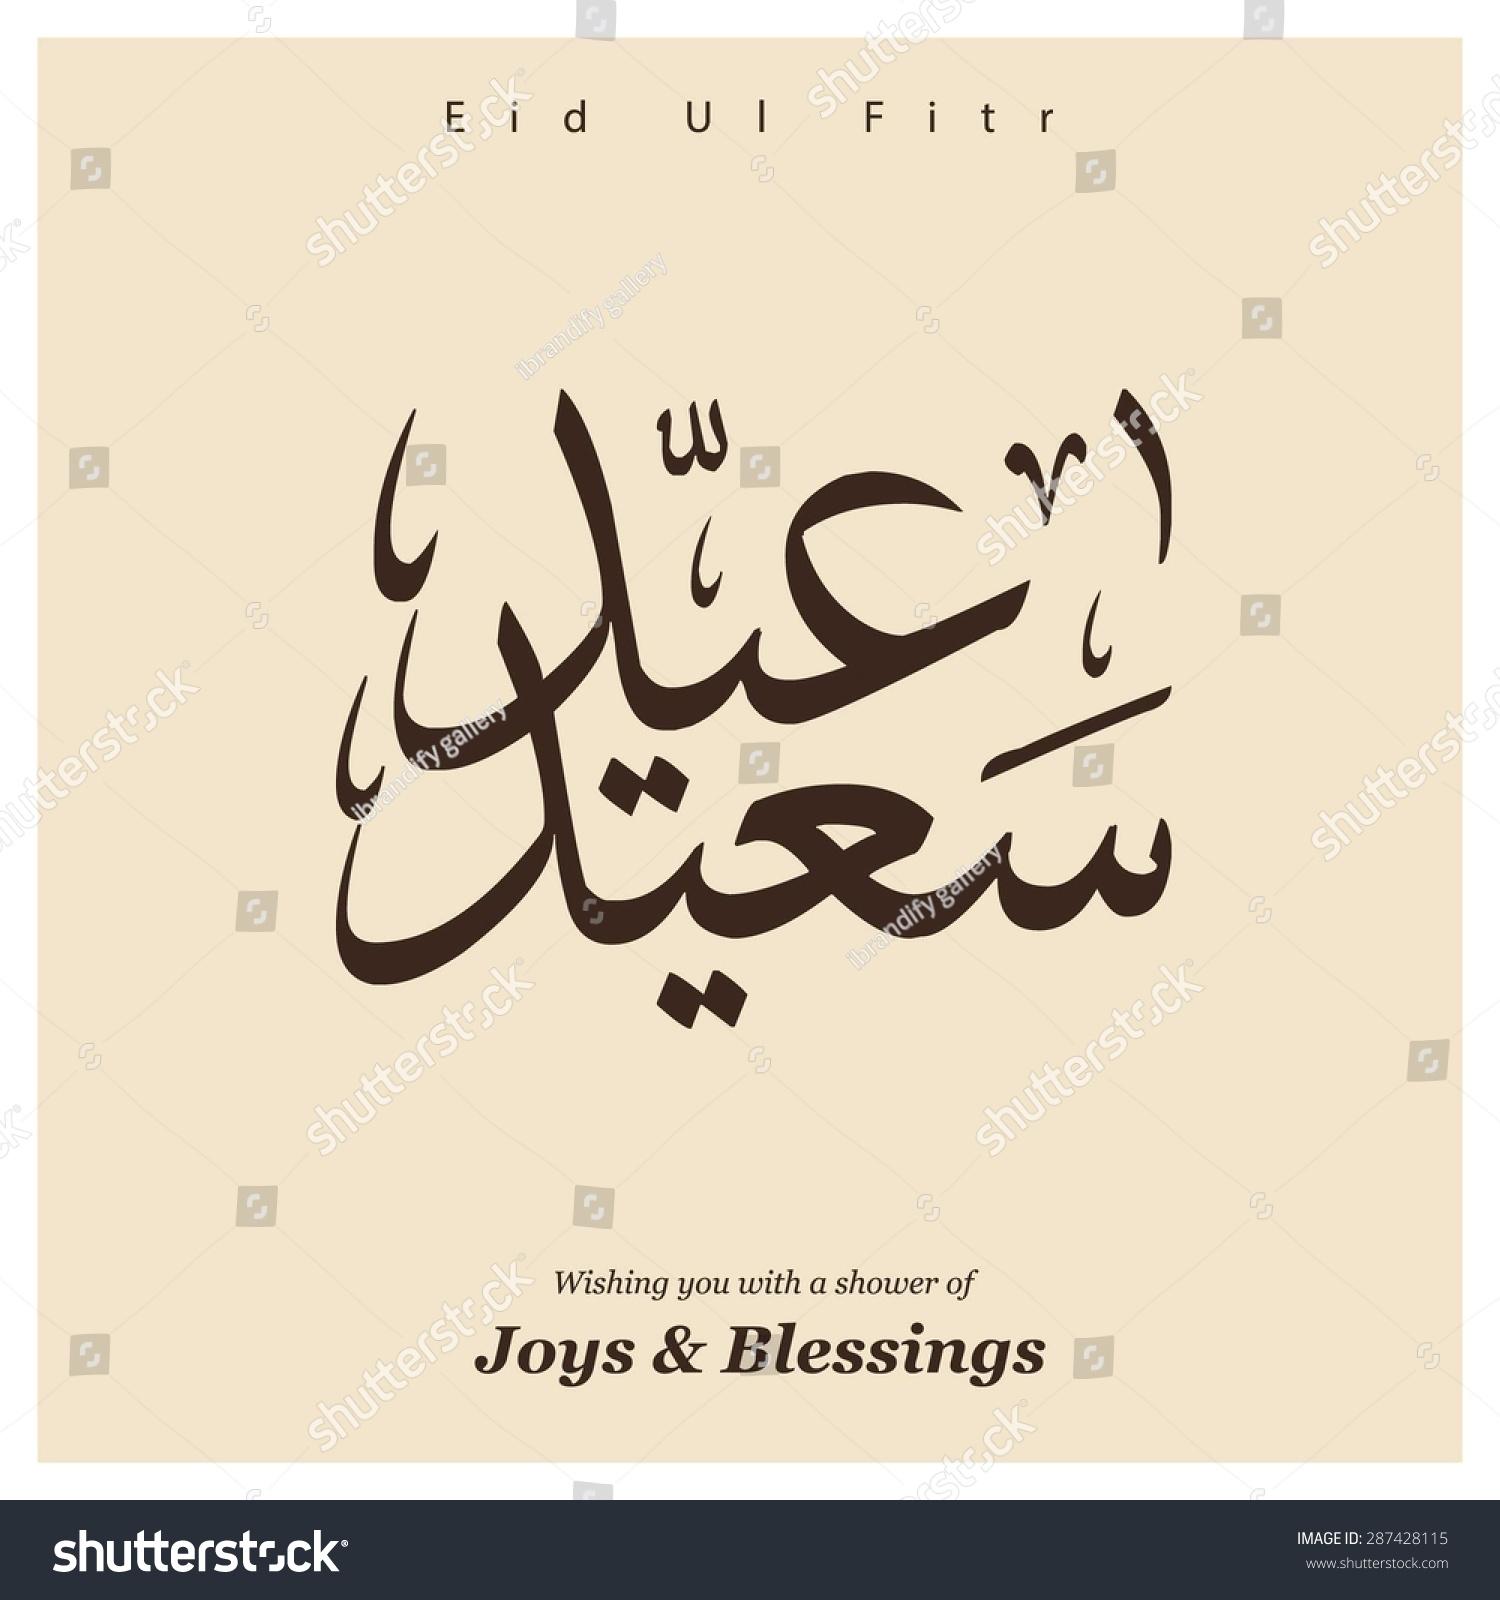 how to write eid mubarak in arabic